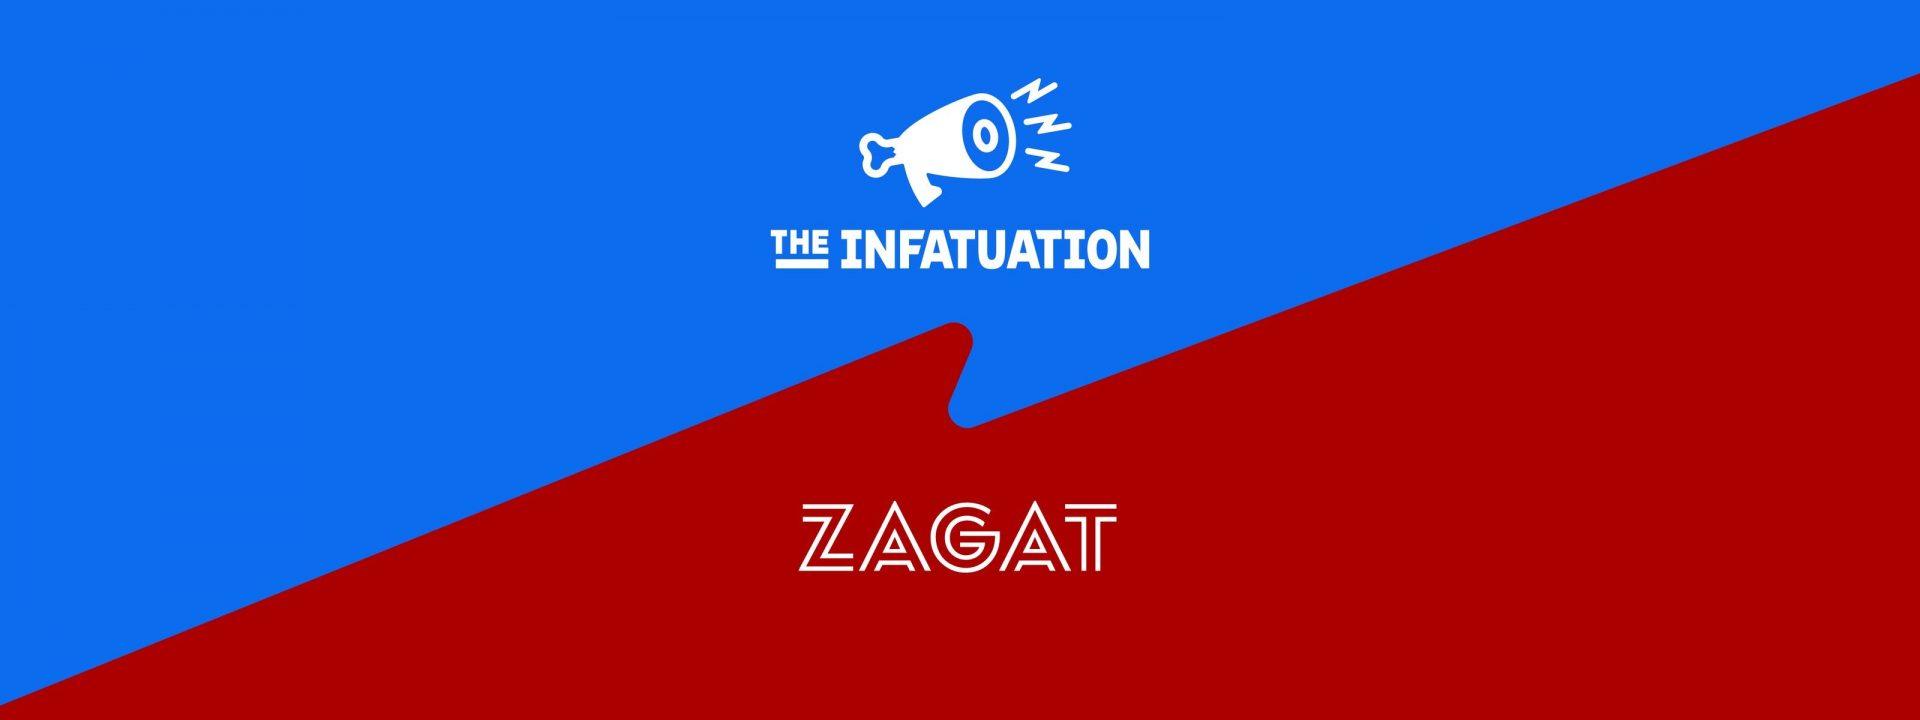 The Infatuation Zagat